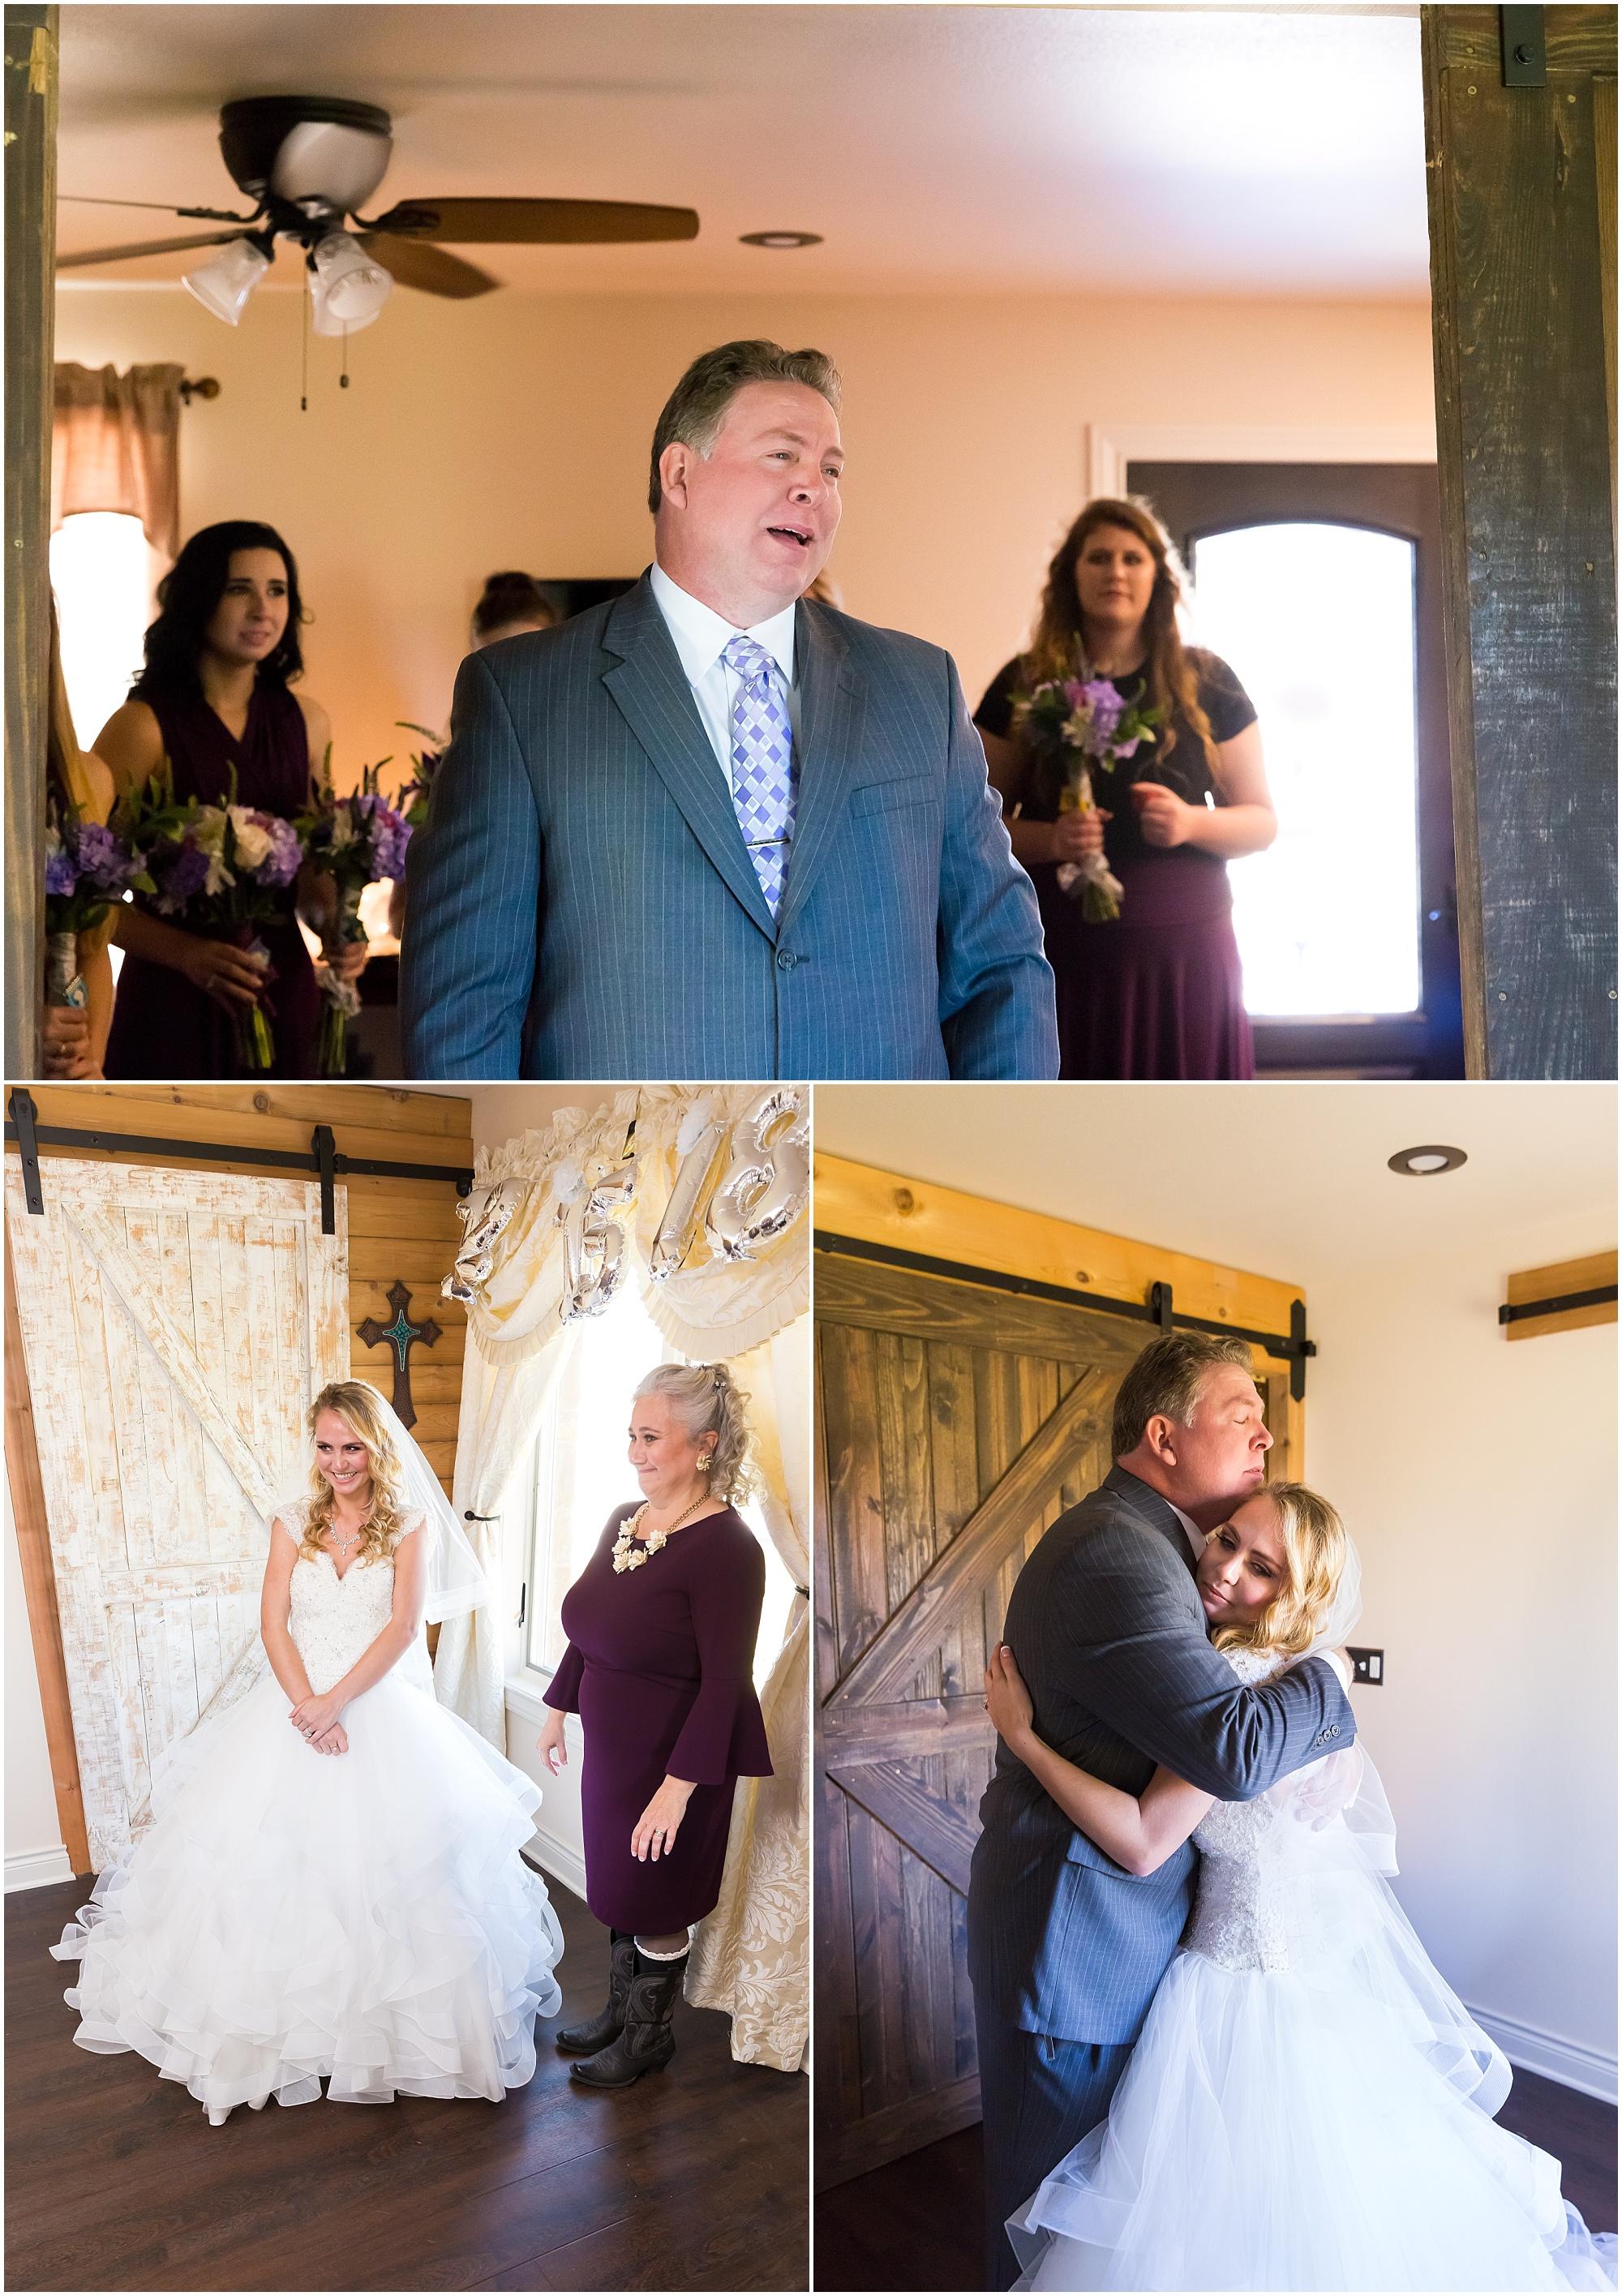 Disney-Inspired-Wedding-Central-Texas_0012.jpg